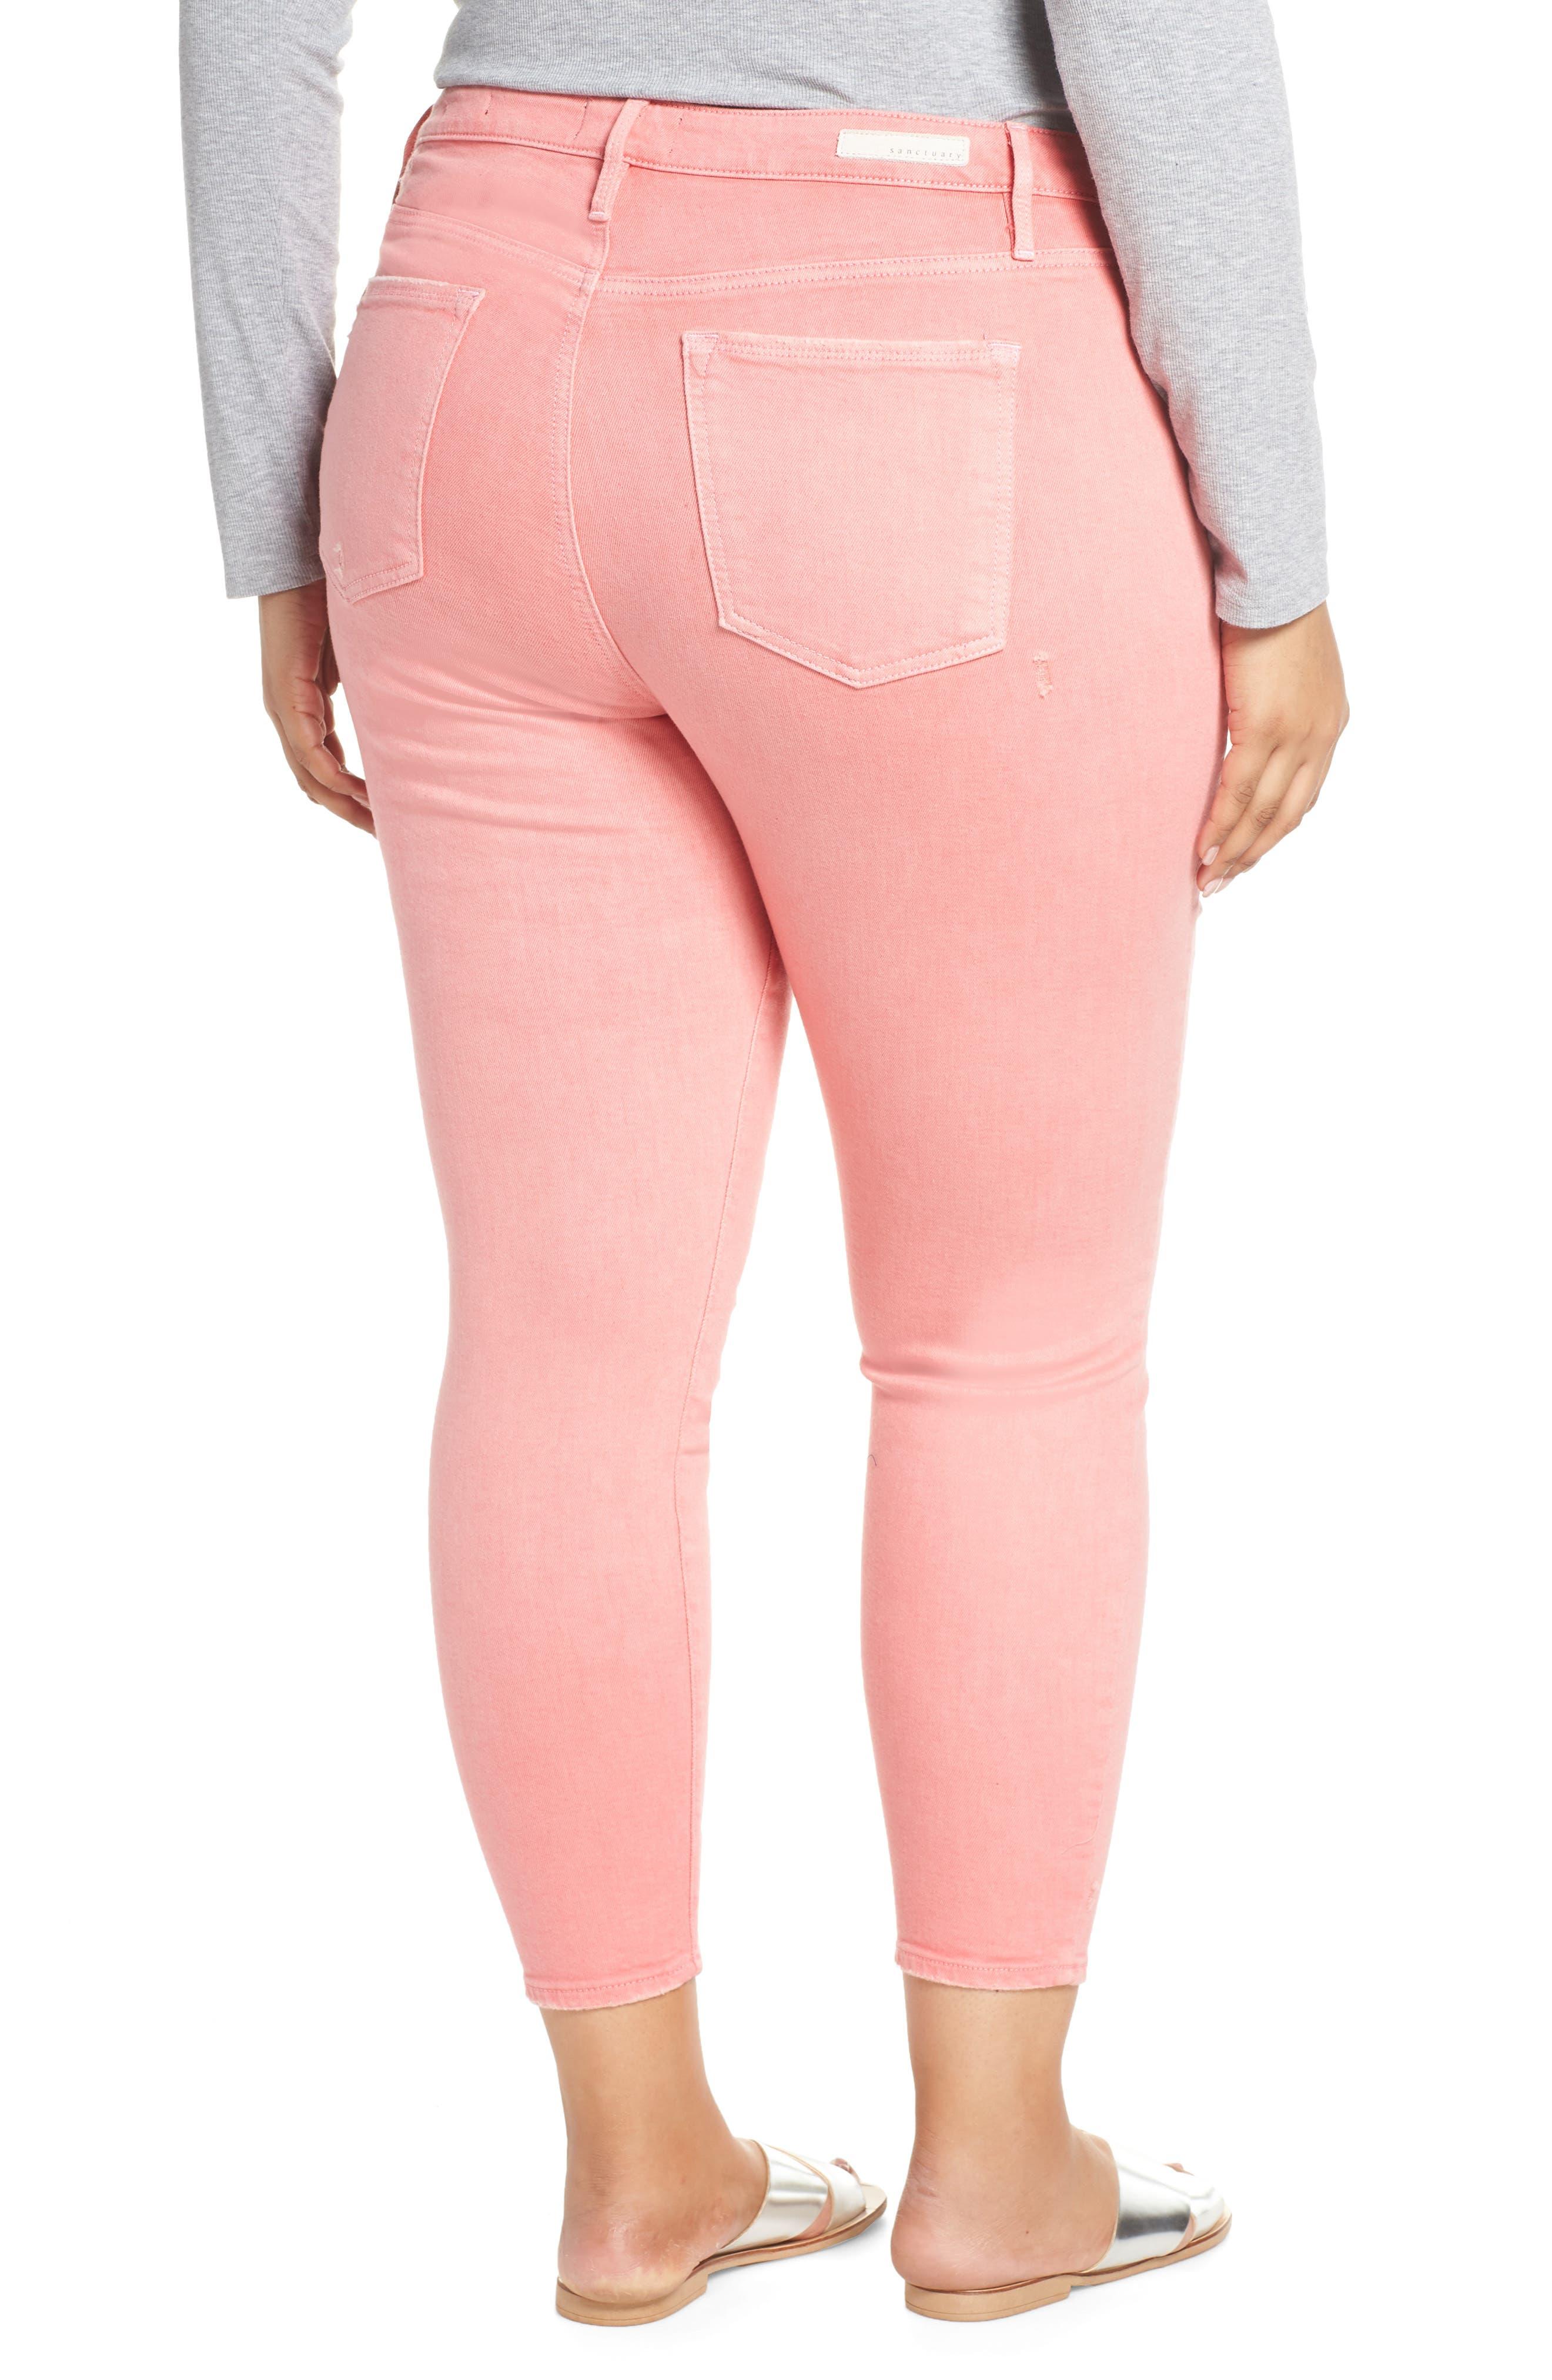 SANCTUARY,                             Social Standard Ankle Skinny Jeans,                             Alternate thumbnail 2, color,                             DK PNK FIZ